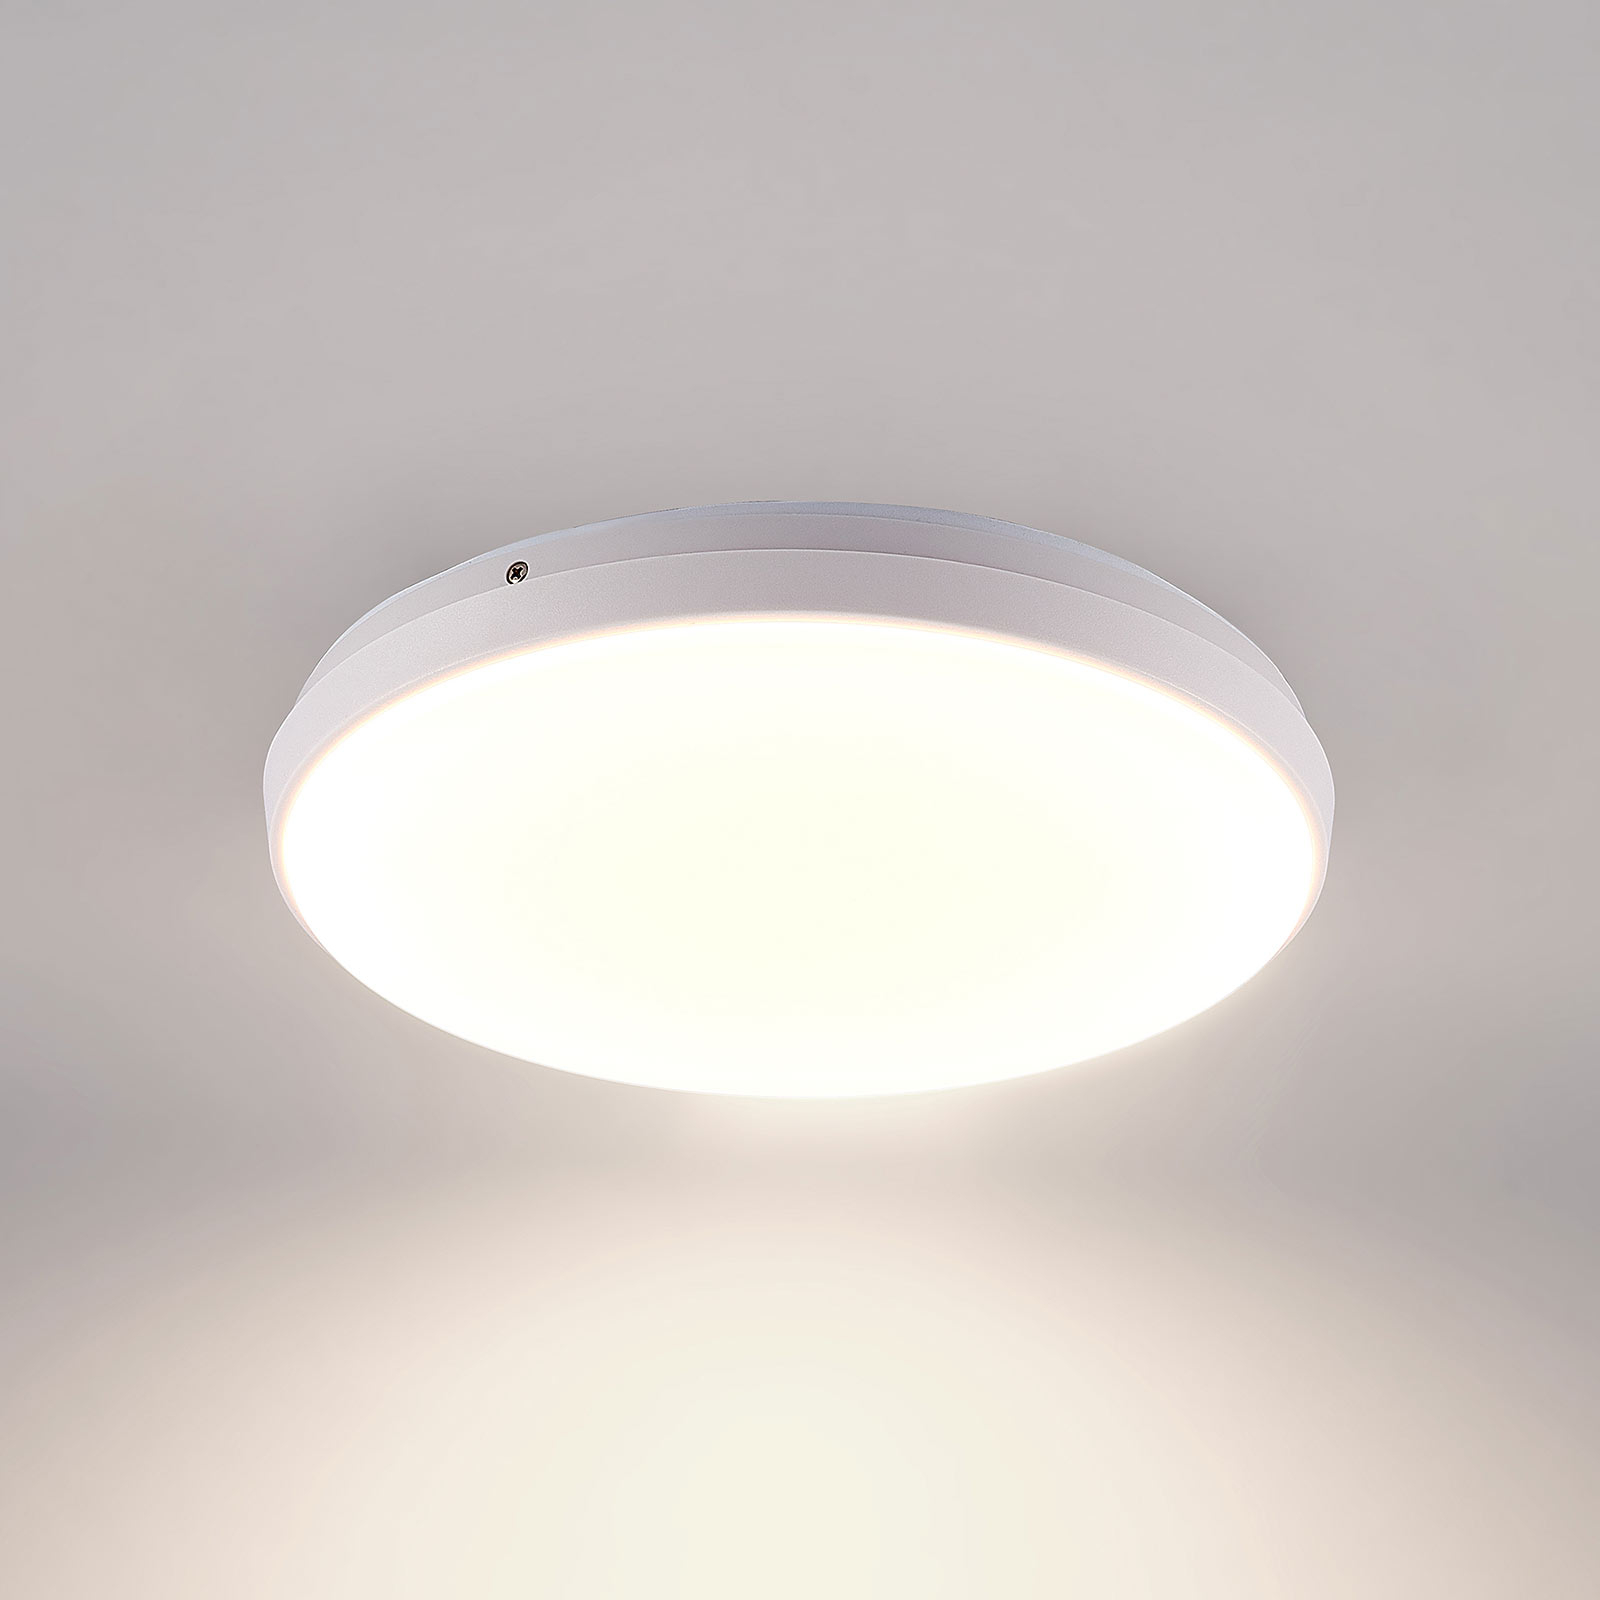 Arcchio Brady LED-loftlampe, hvid, rund, 30 cm